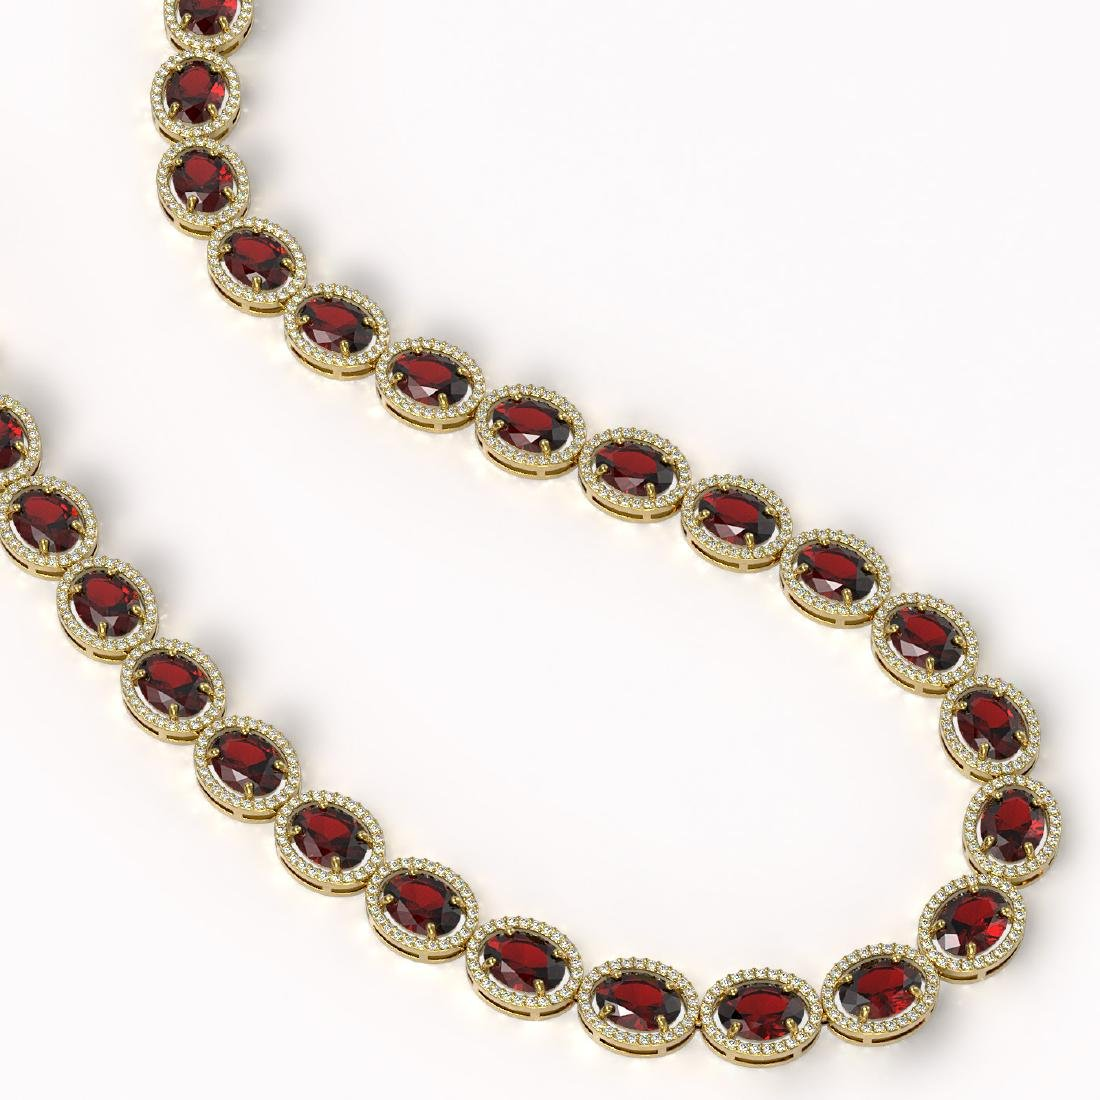 62.99 CTW Garnet & Diamond Halo Necklace 10K Yellow